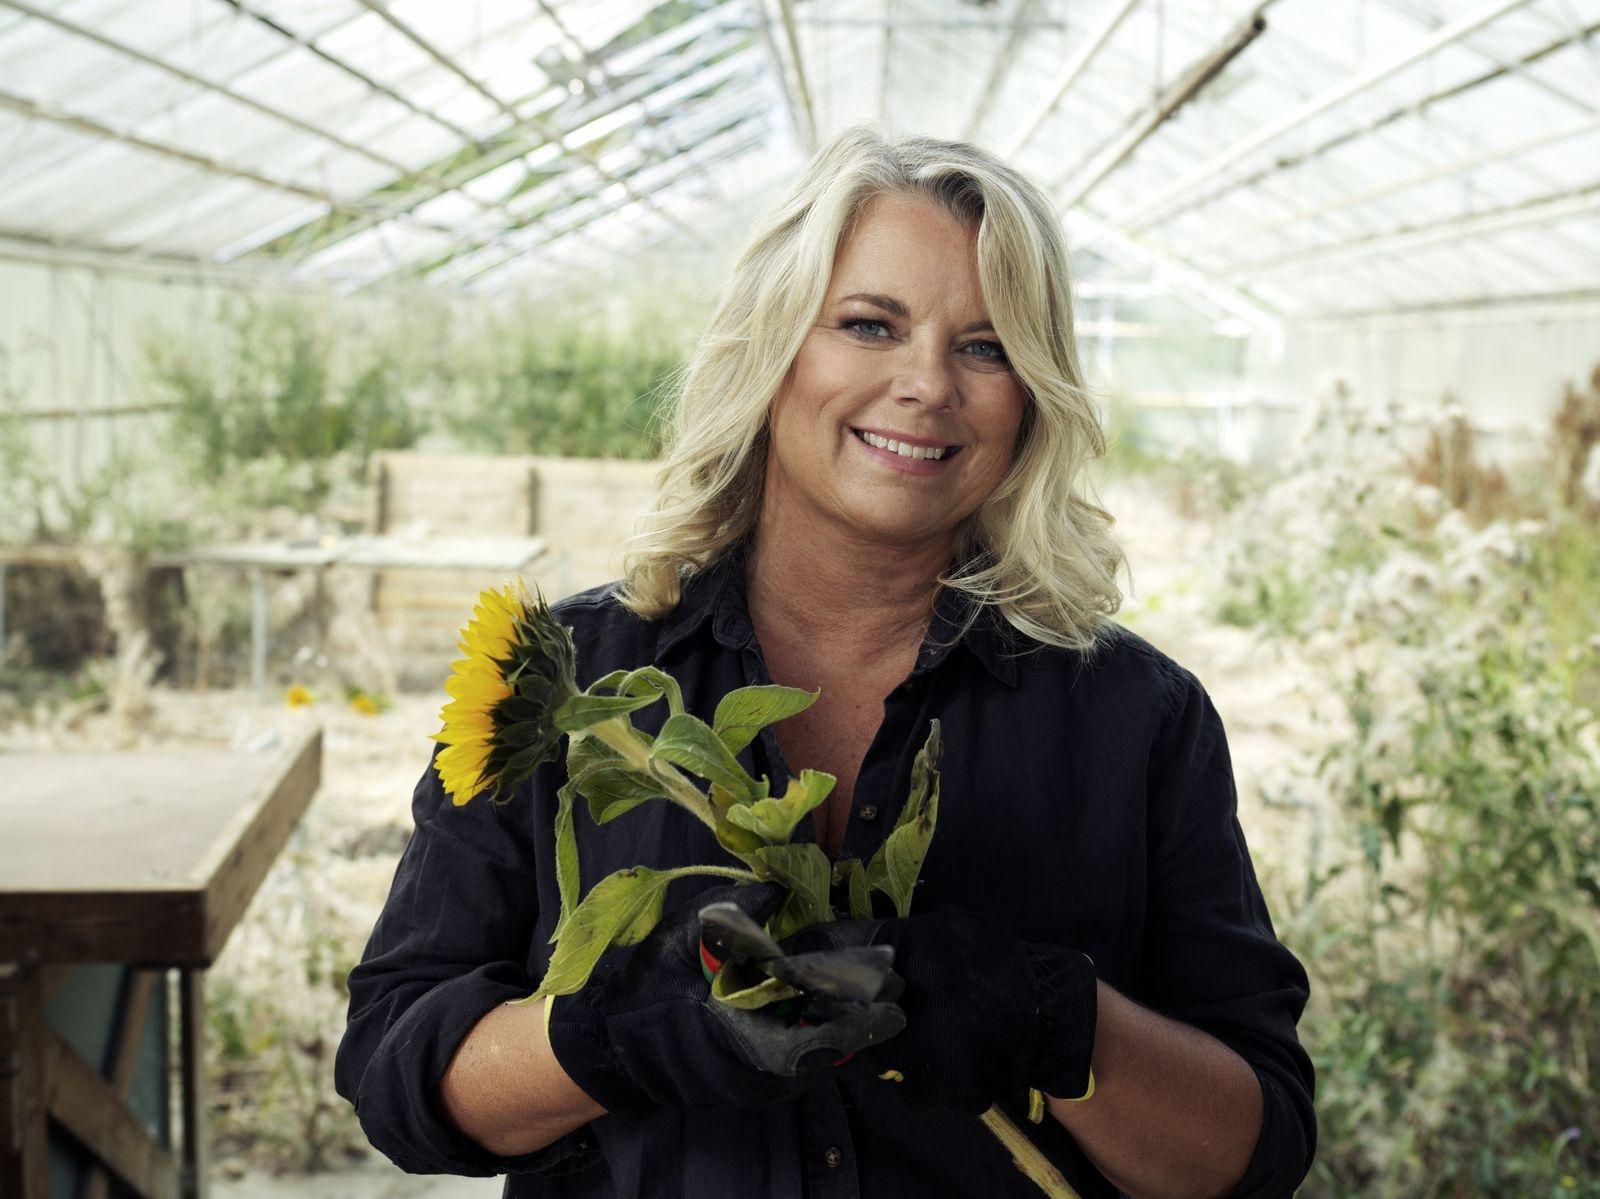 Vesna Lisjak Roth, Kttingvgen 27, Trelleborg | patient-survey.net